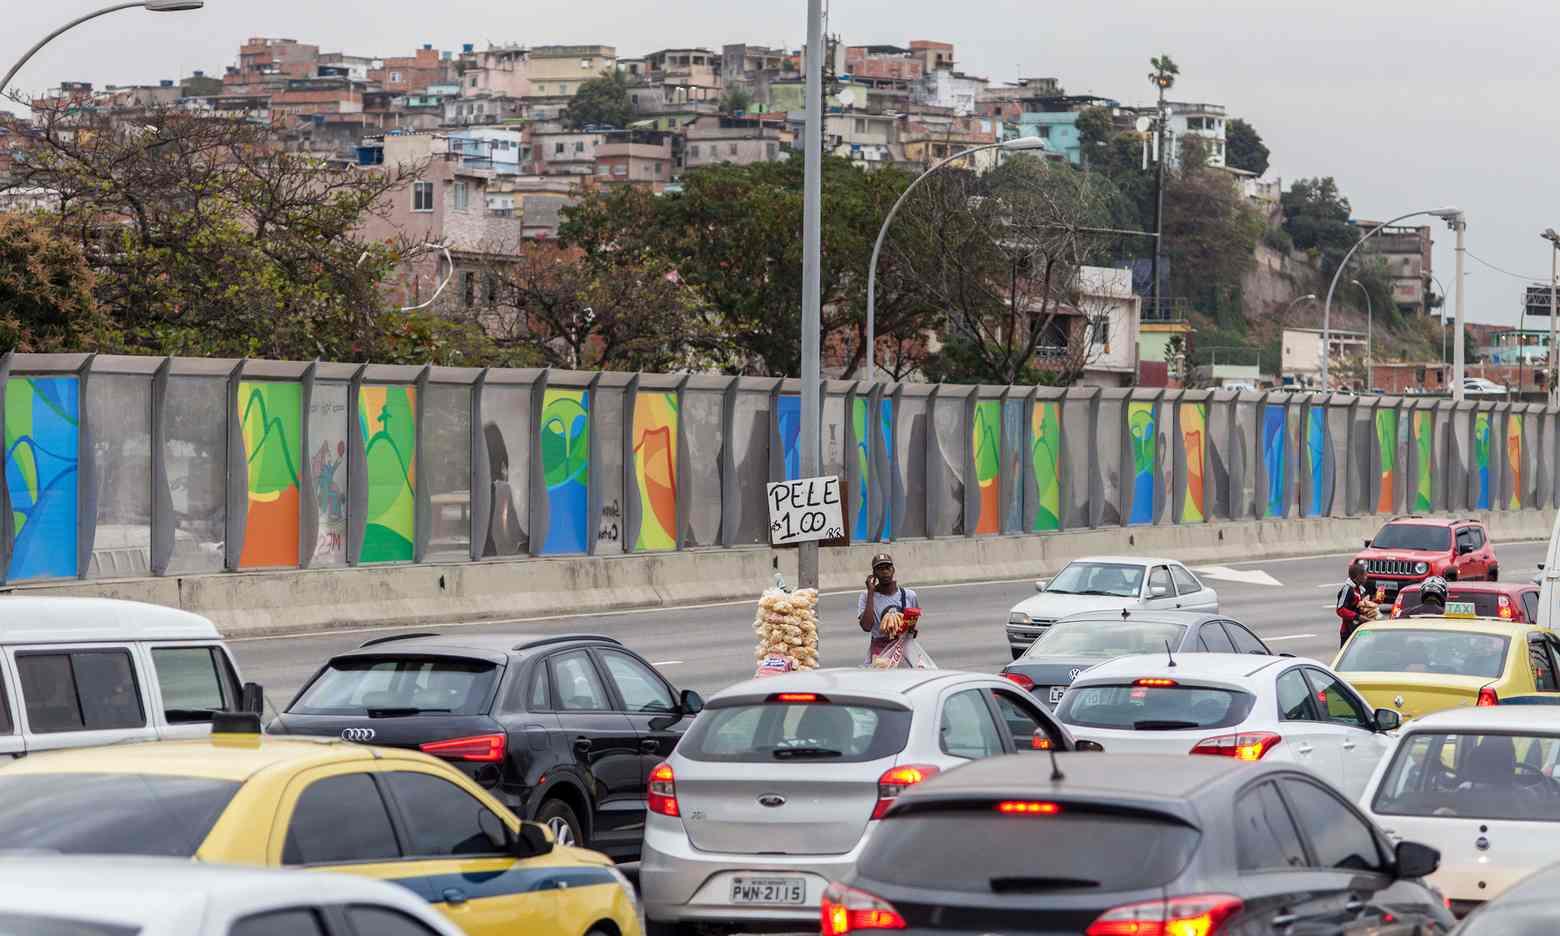 The 'wall of shame', which hides the Maré favela. Photograph: LightRocket via Getty/Brazil Photos